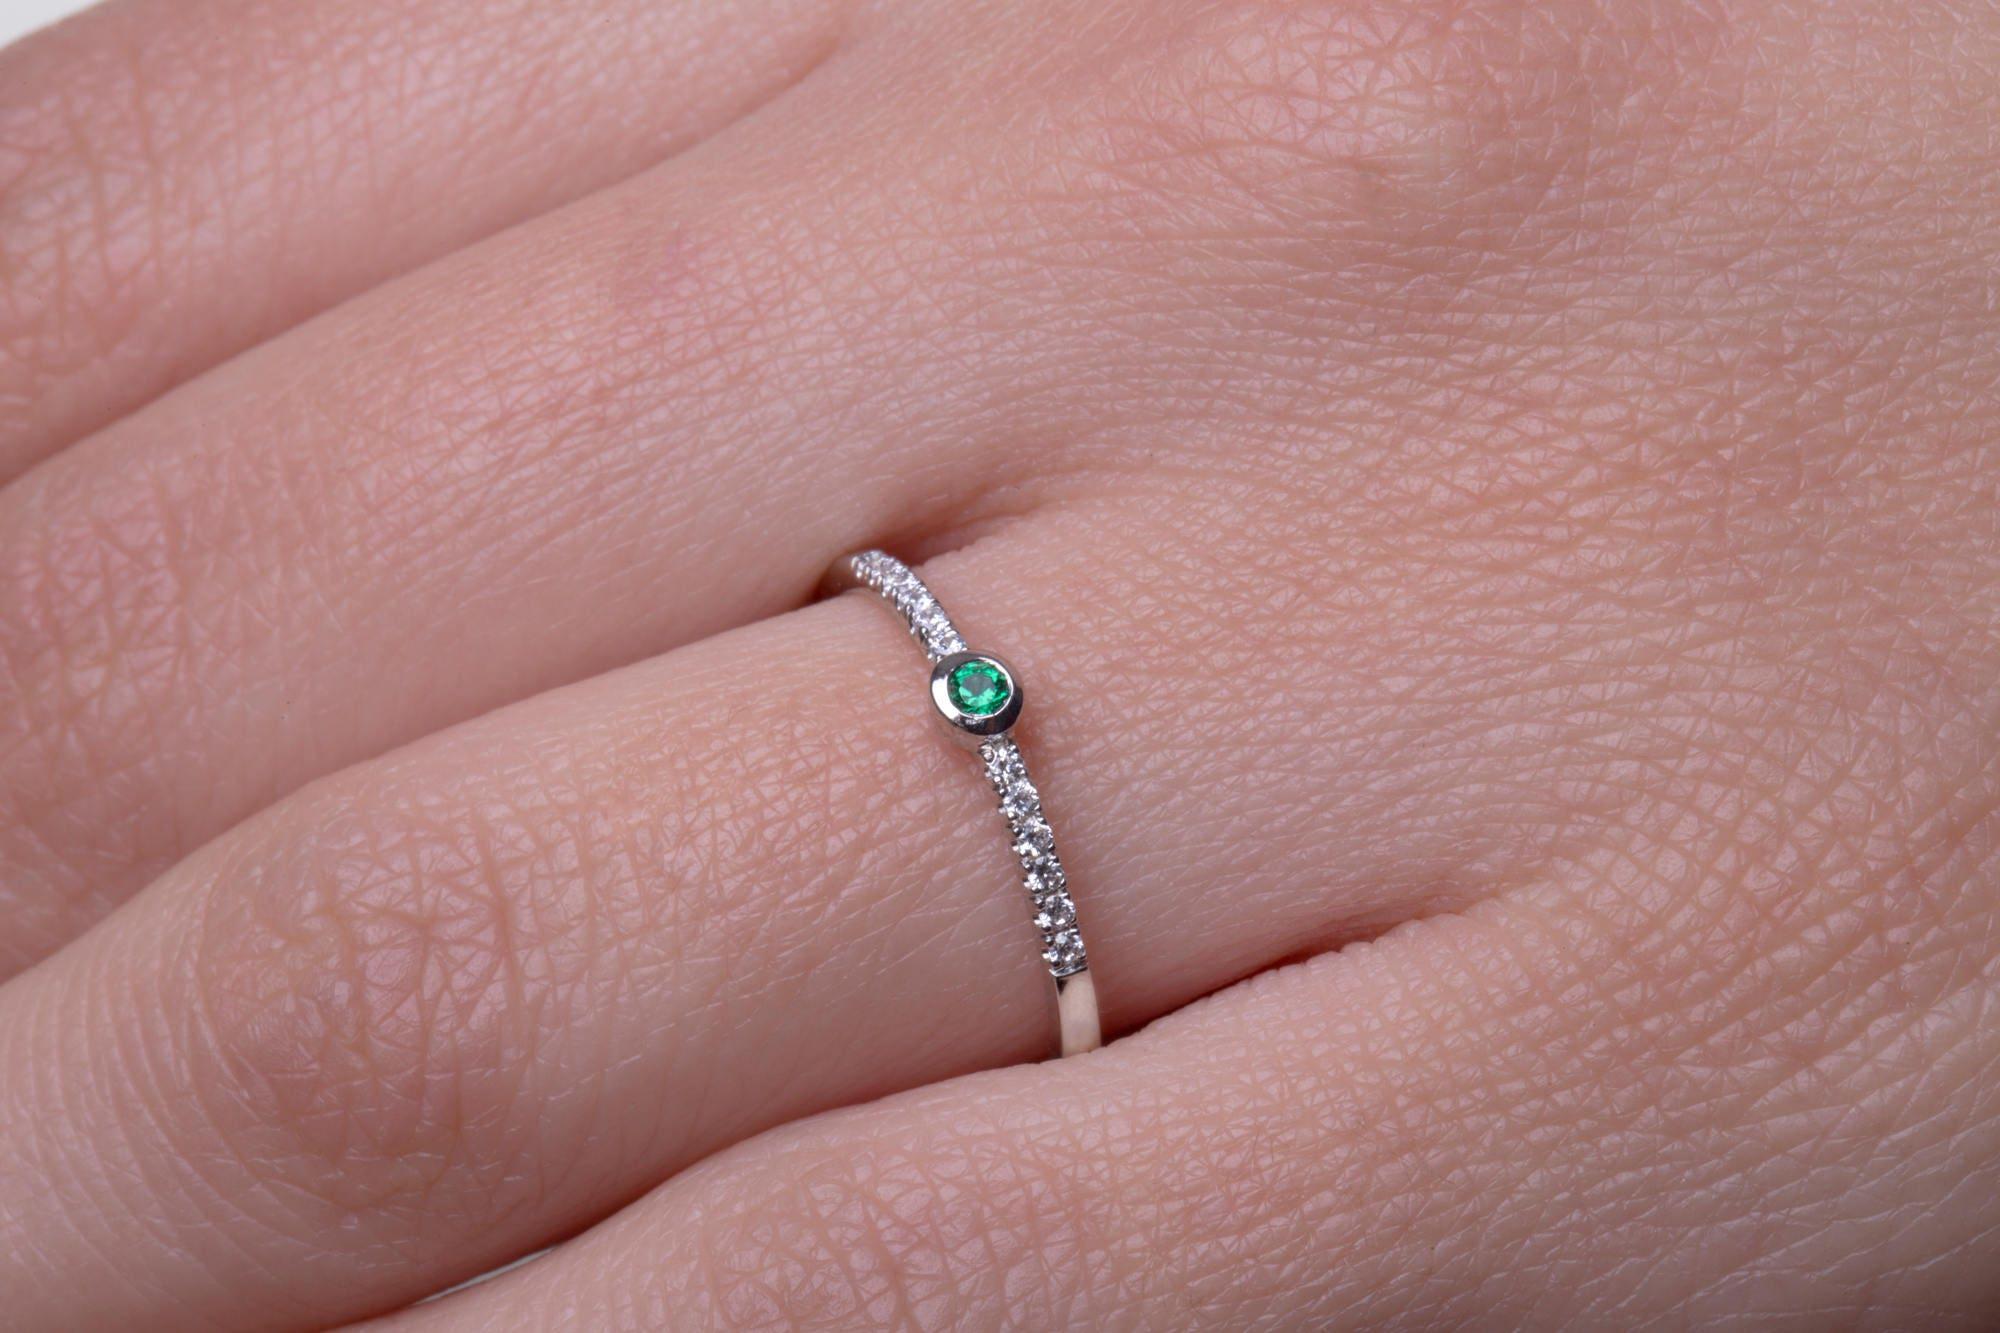 Emerald ring Dainty diamond ring Tiny solitaire ring Tiny